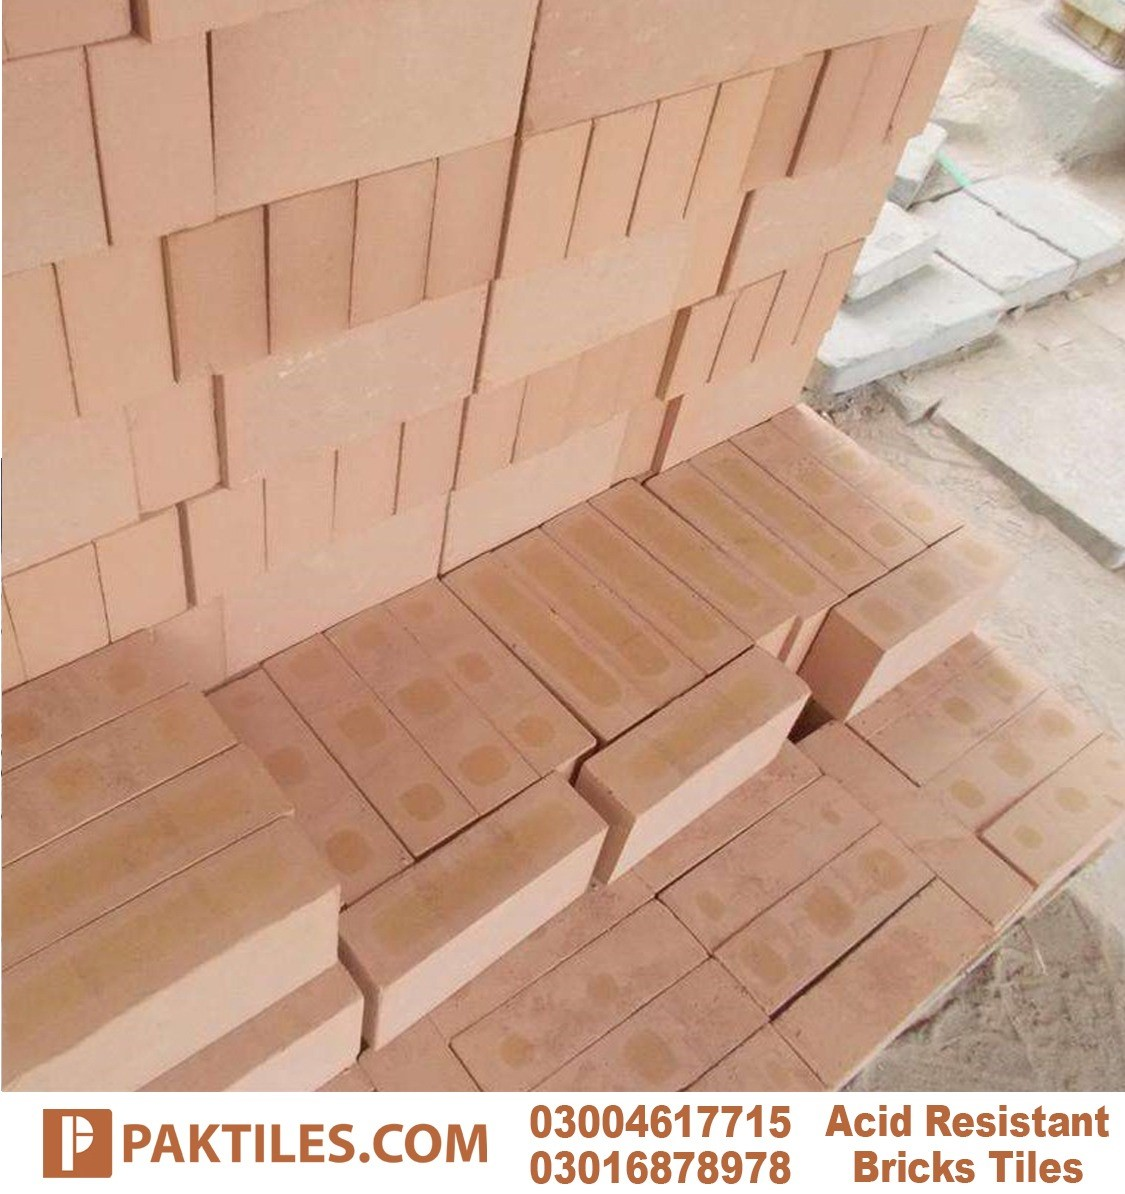 Acid Resistant Brick Specification